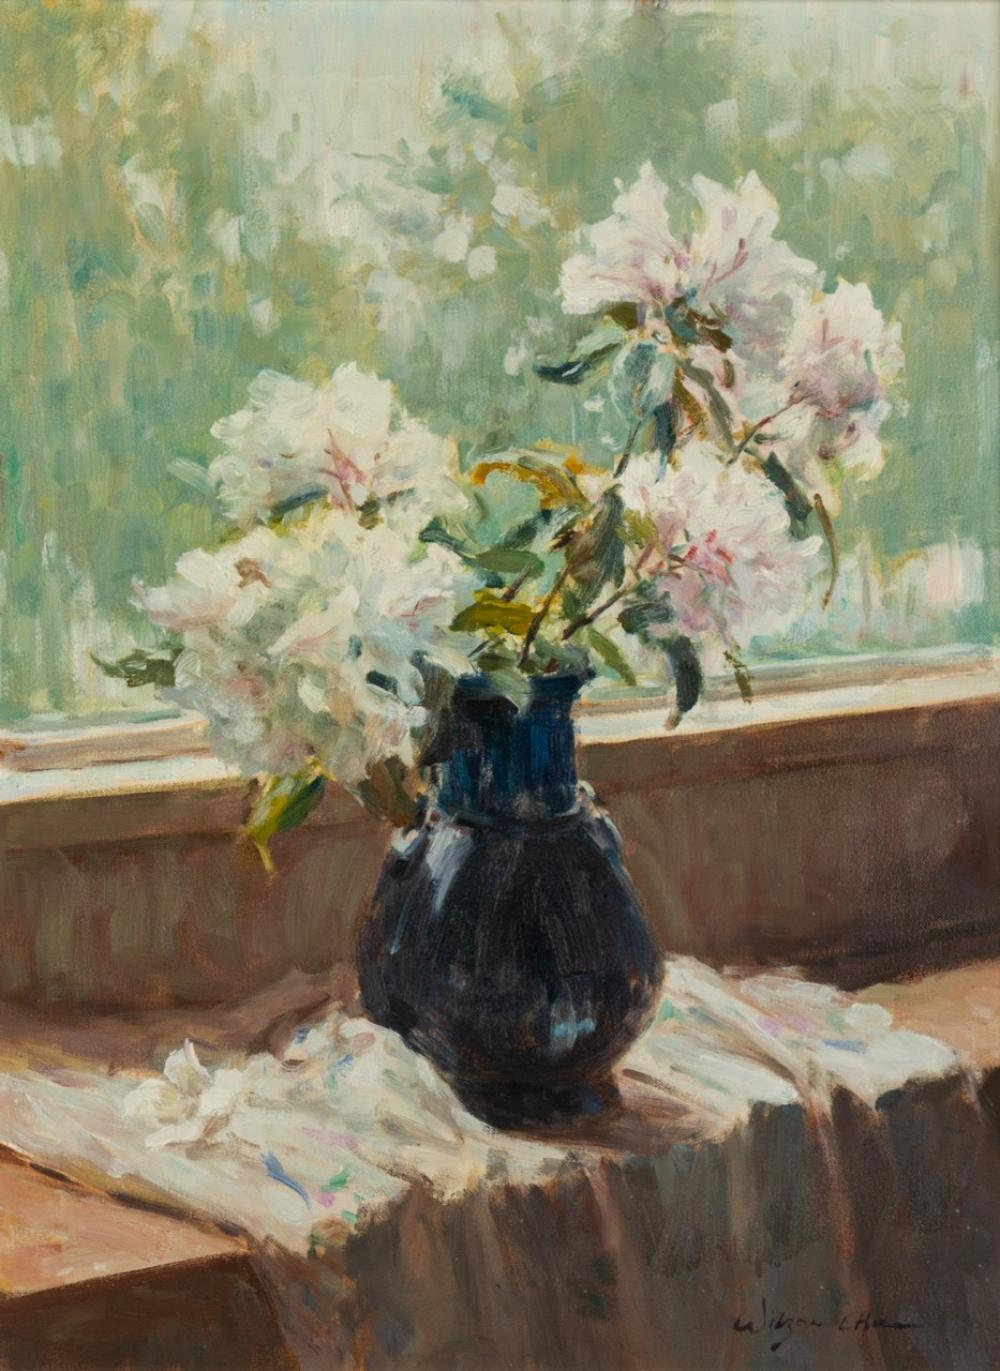 Wilson Chu, Canadian (1946- ), Soft Light, 24 x 18 in. (60.9 x 45.7 cm)